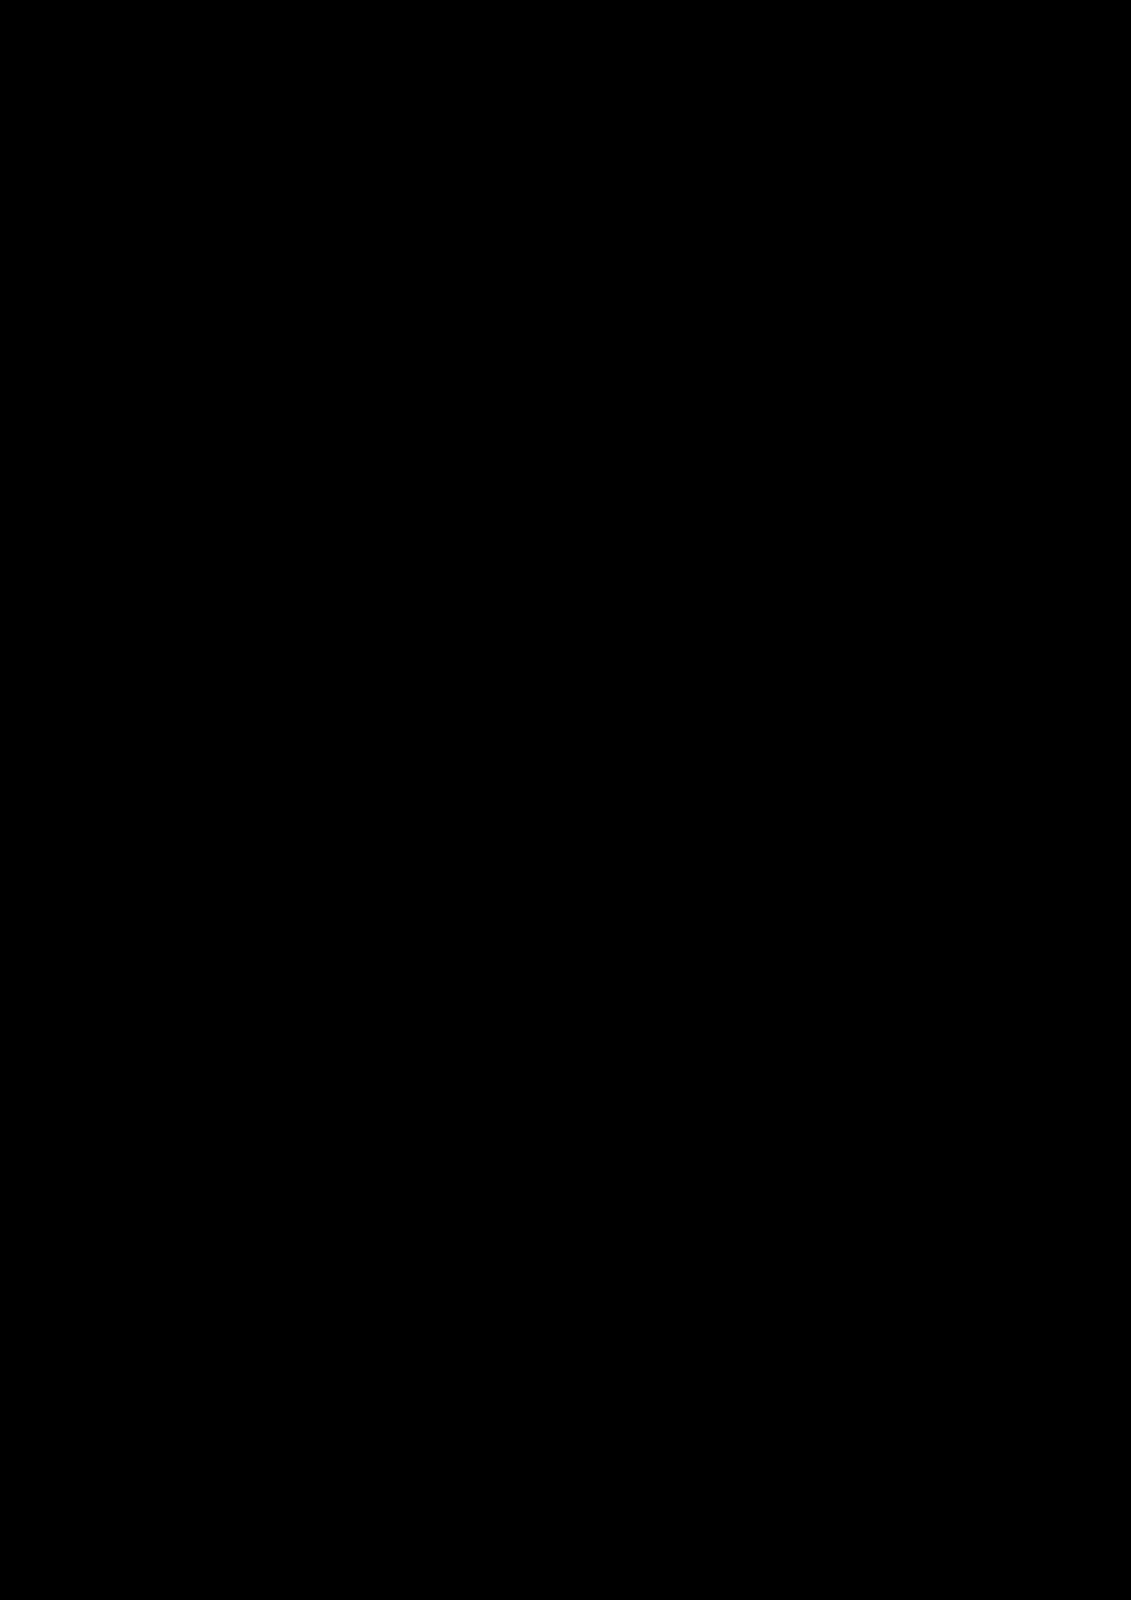 Music clarinet music score dragon ball z partituras dibujos animados